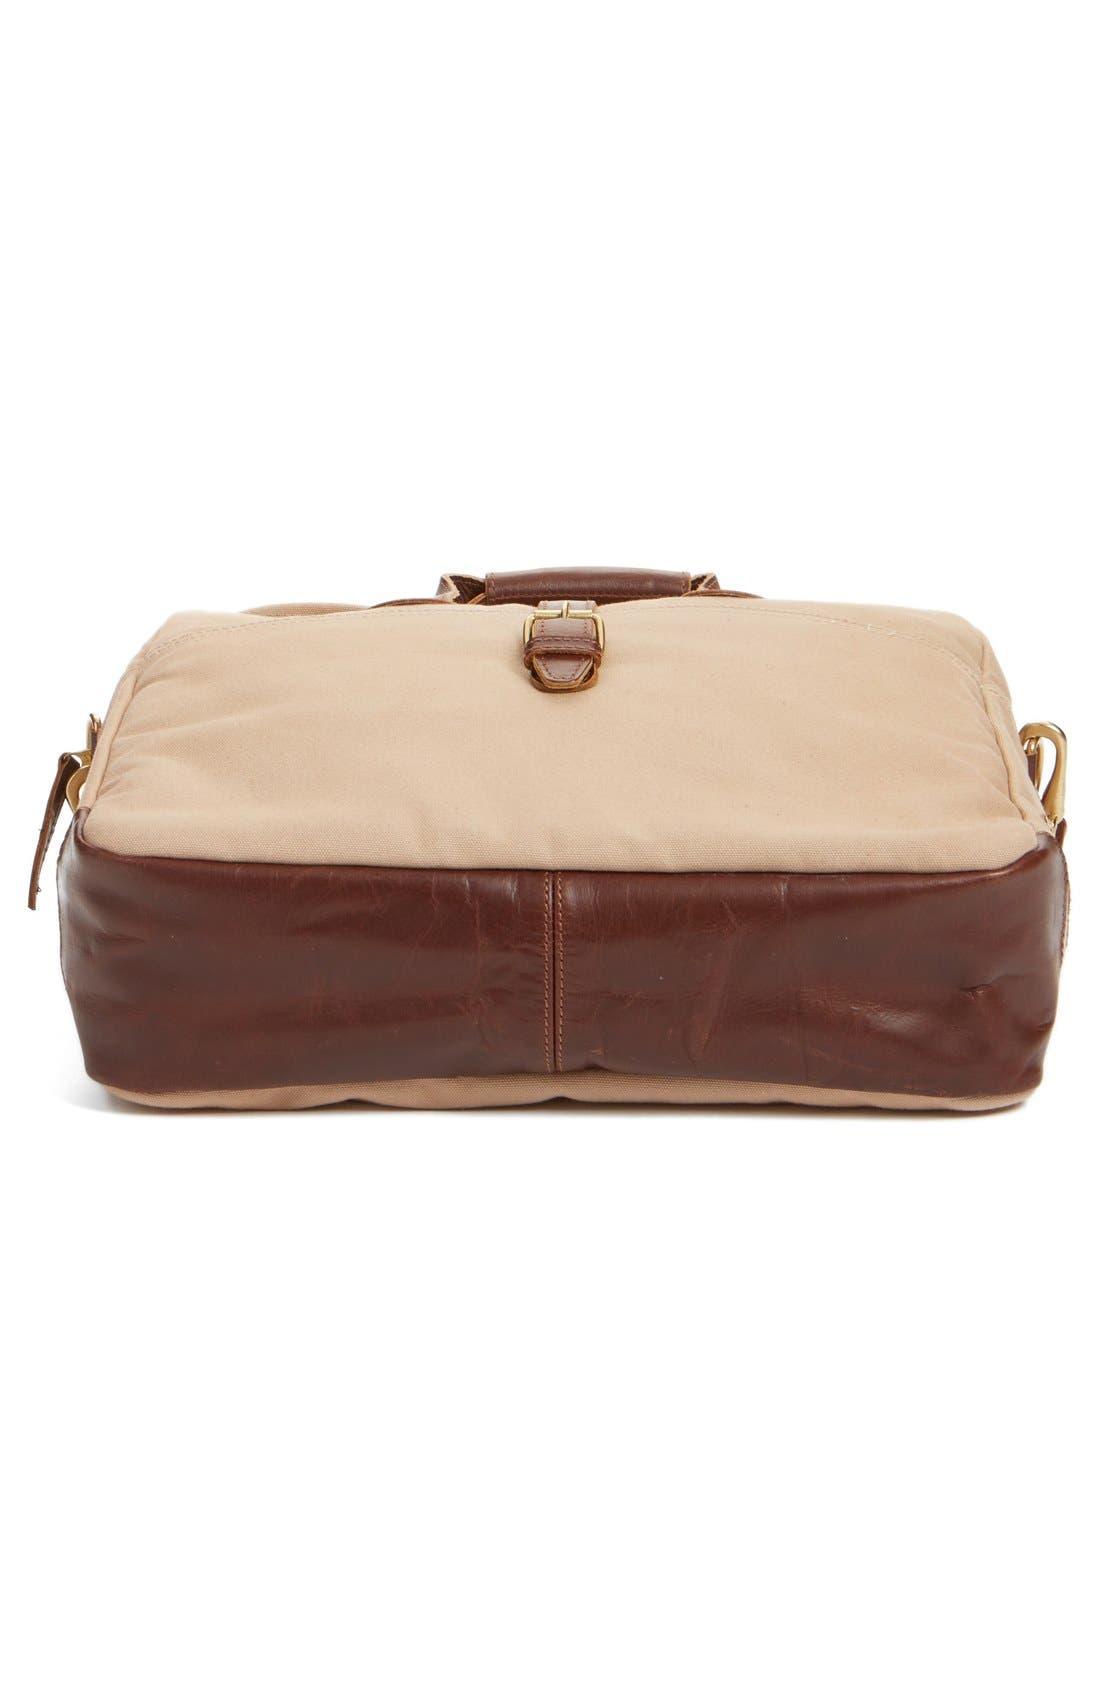 'Lakeland' Laptop Bag,                             Alternate thumbnail 7, color,                             Tan